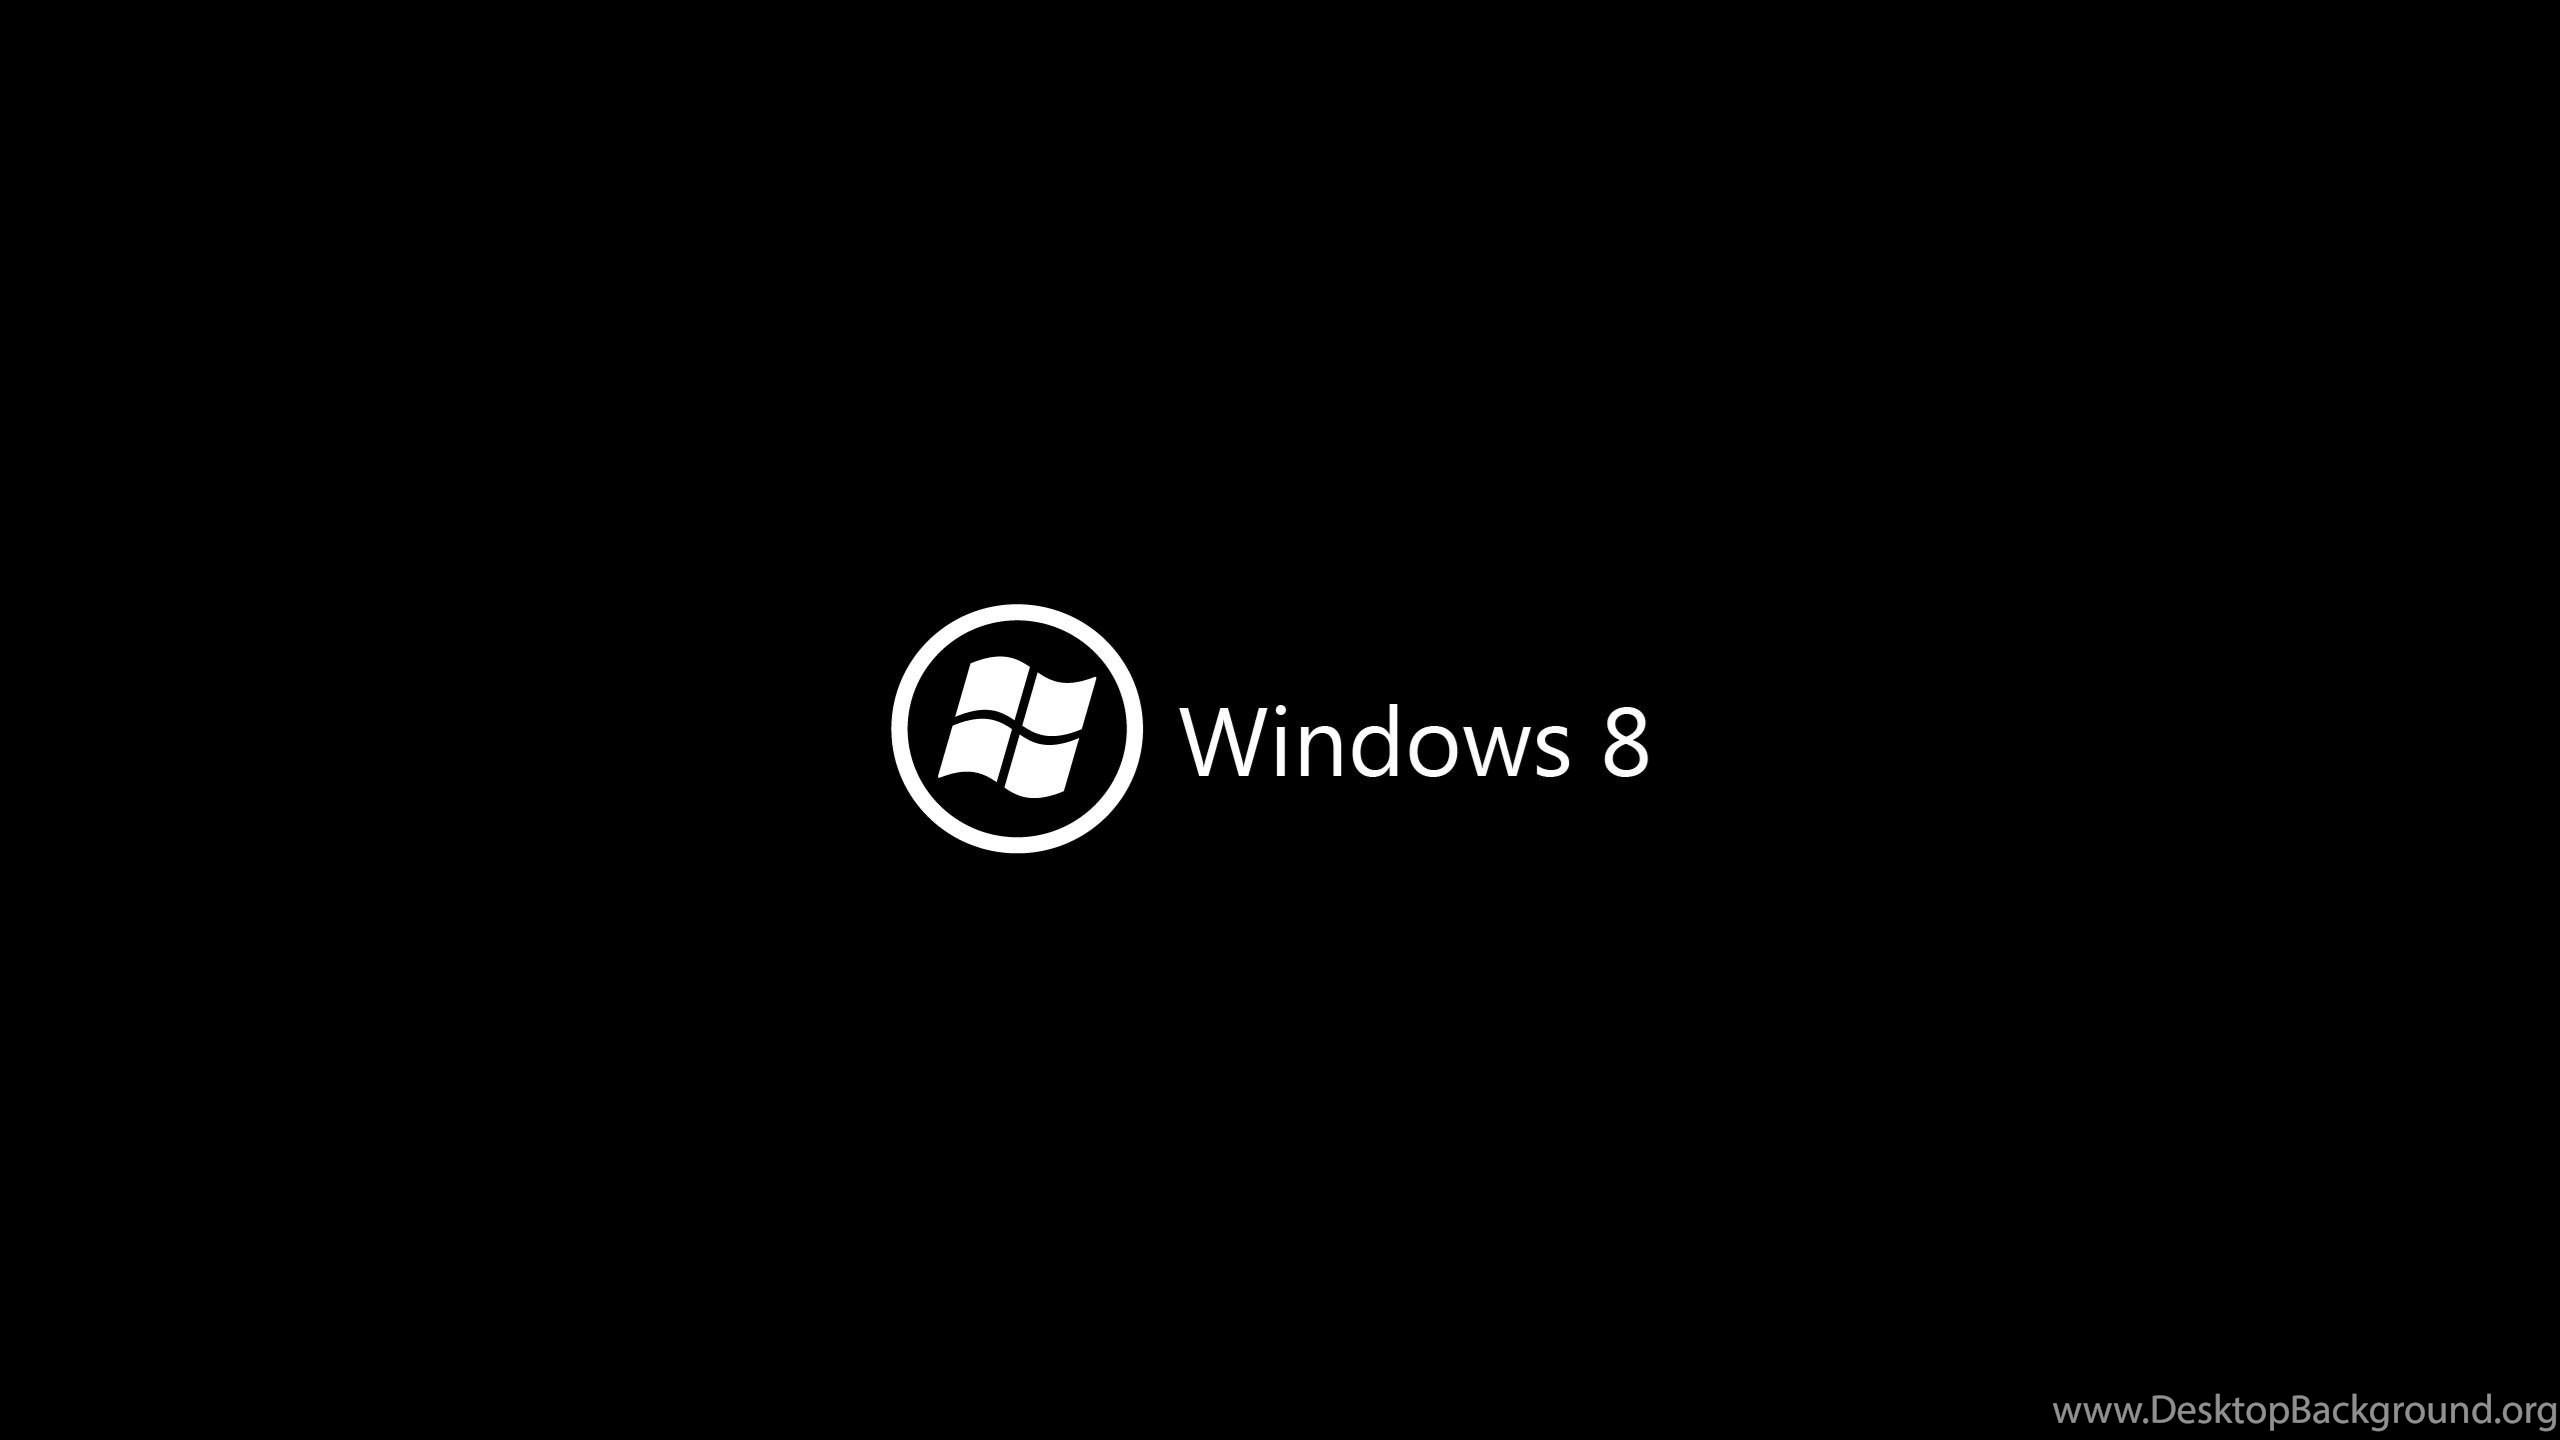 Windows 8 Logo Black Wallpaper Desktop Background